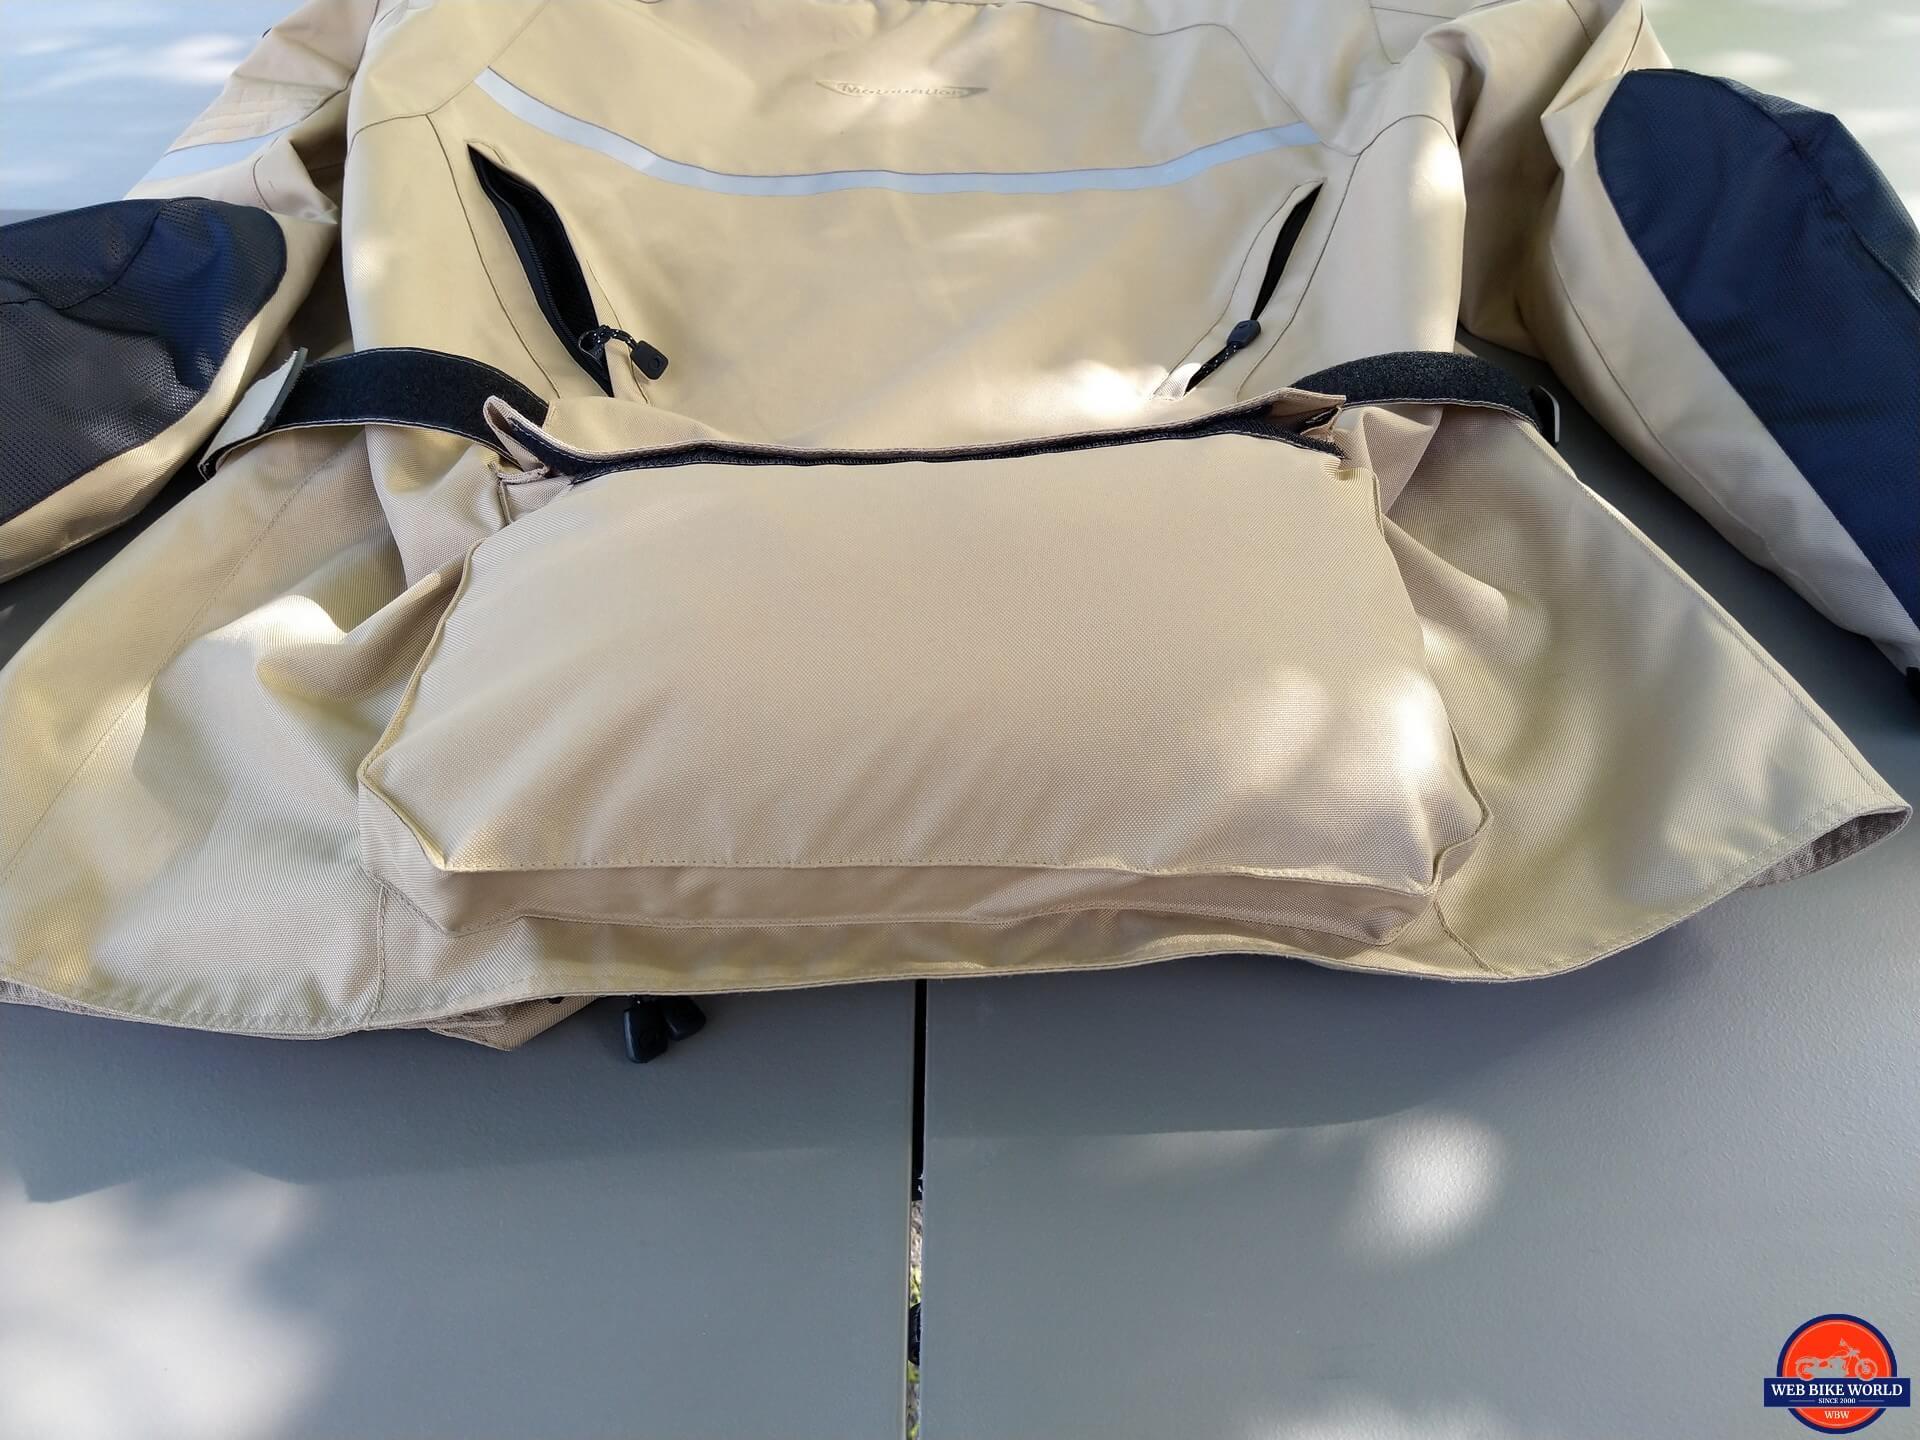 Motonation Pursang Textile Adventure Jacket filled cargo pocket